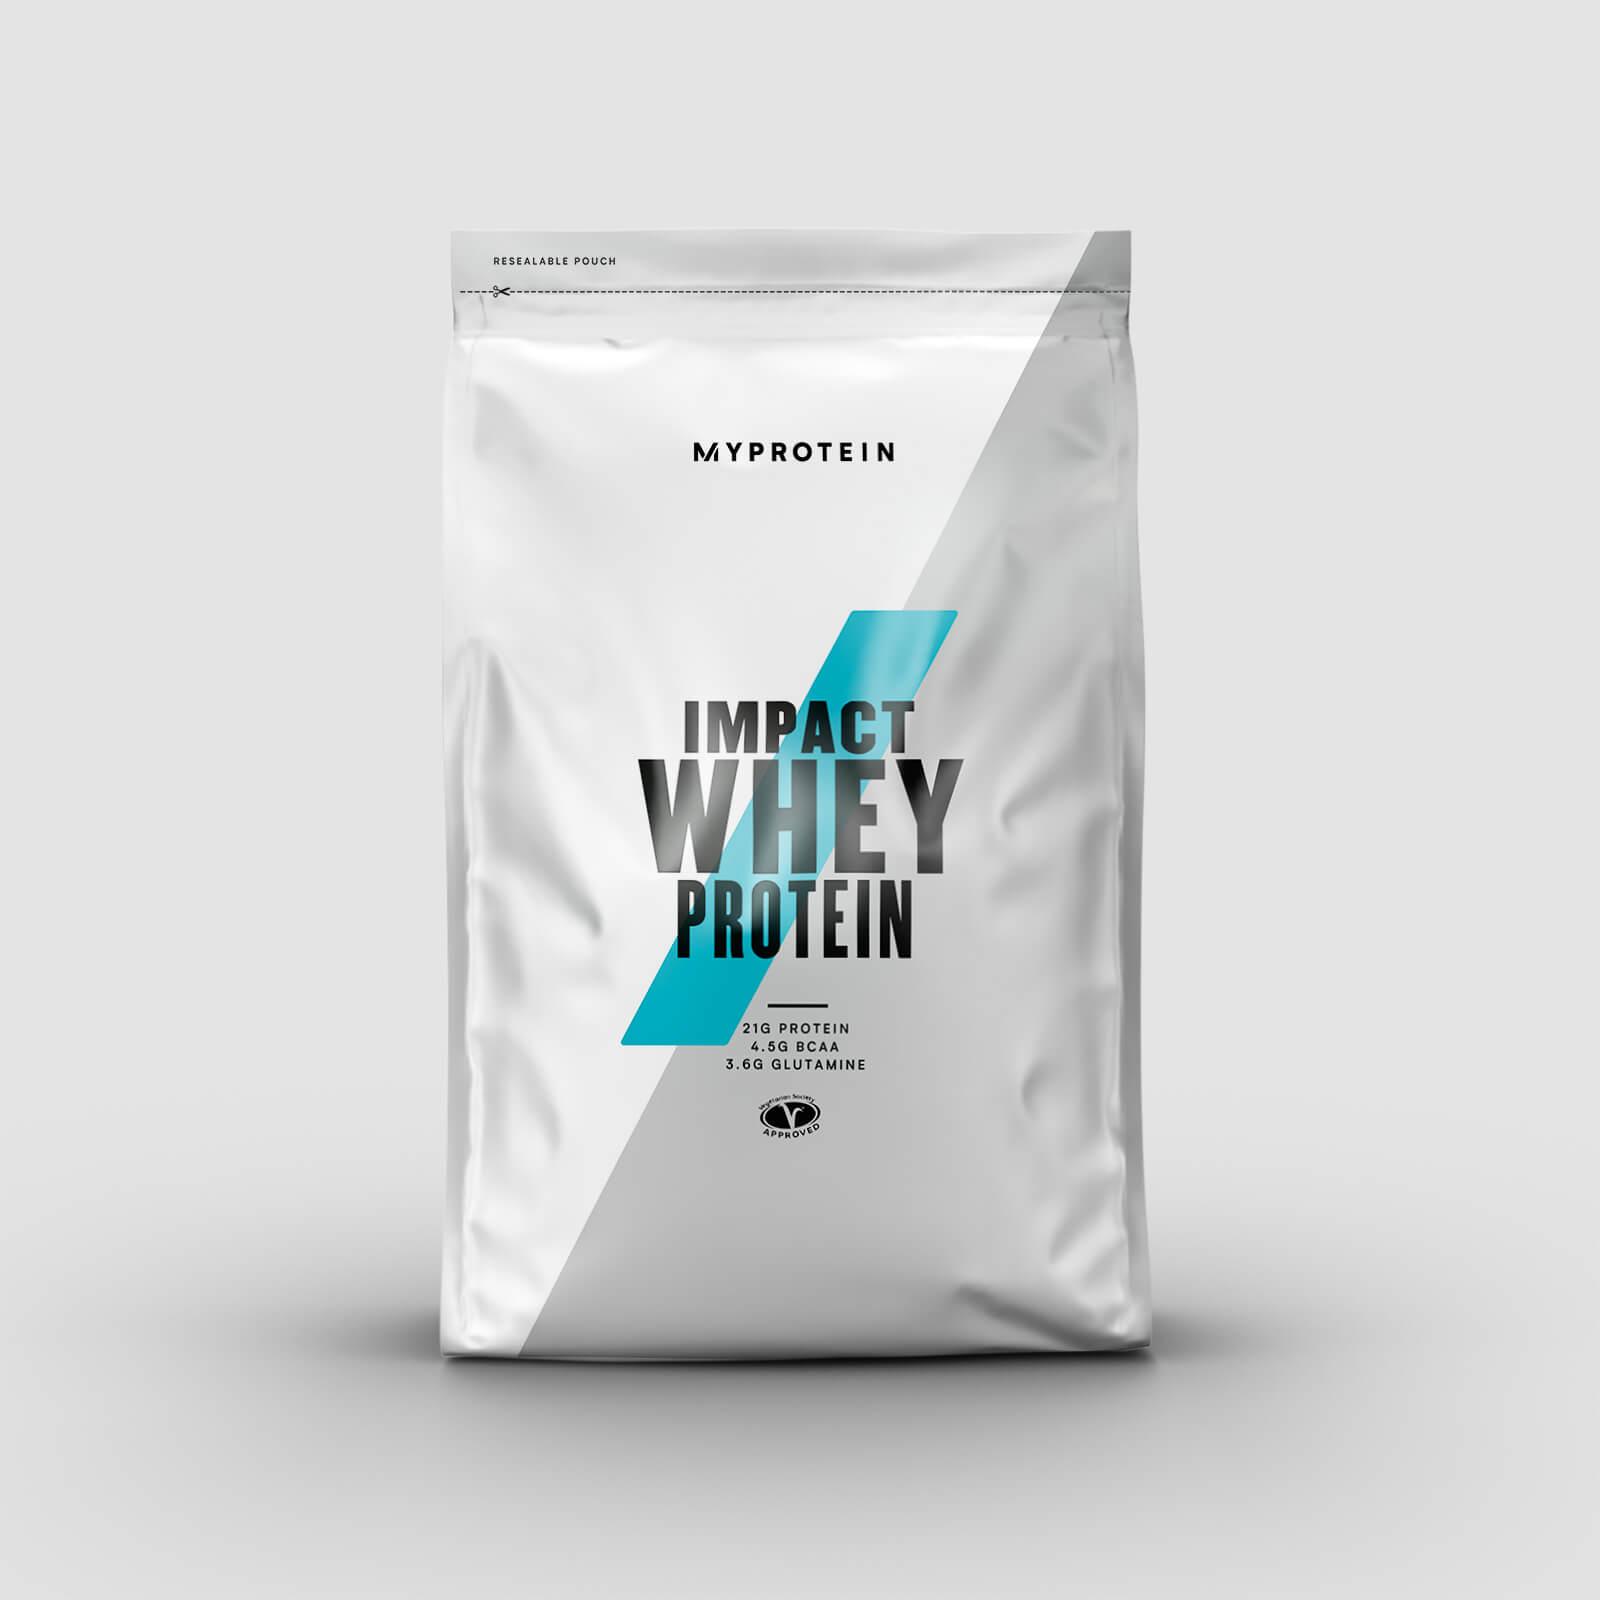 myprotein impact whey protein - 2.5kg - sciroppo di acero